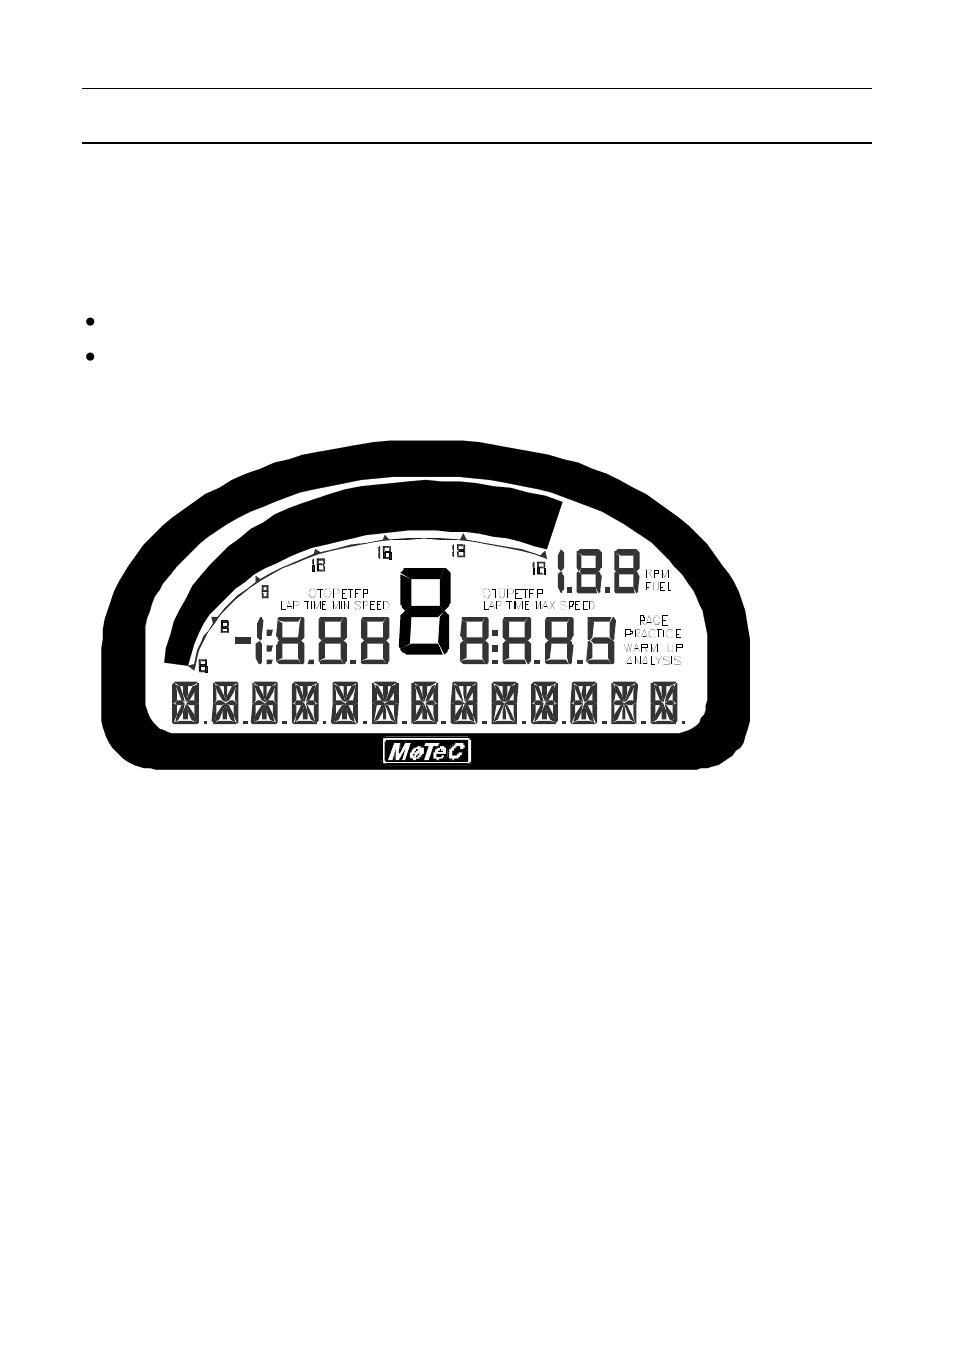 Display | MoTeC ADL3 EDL3 User Manual | Page 31 / 80